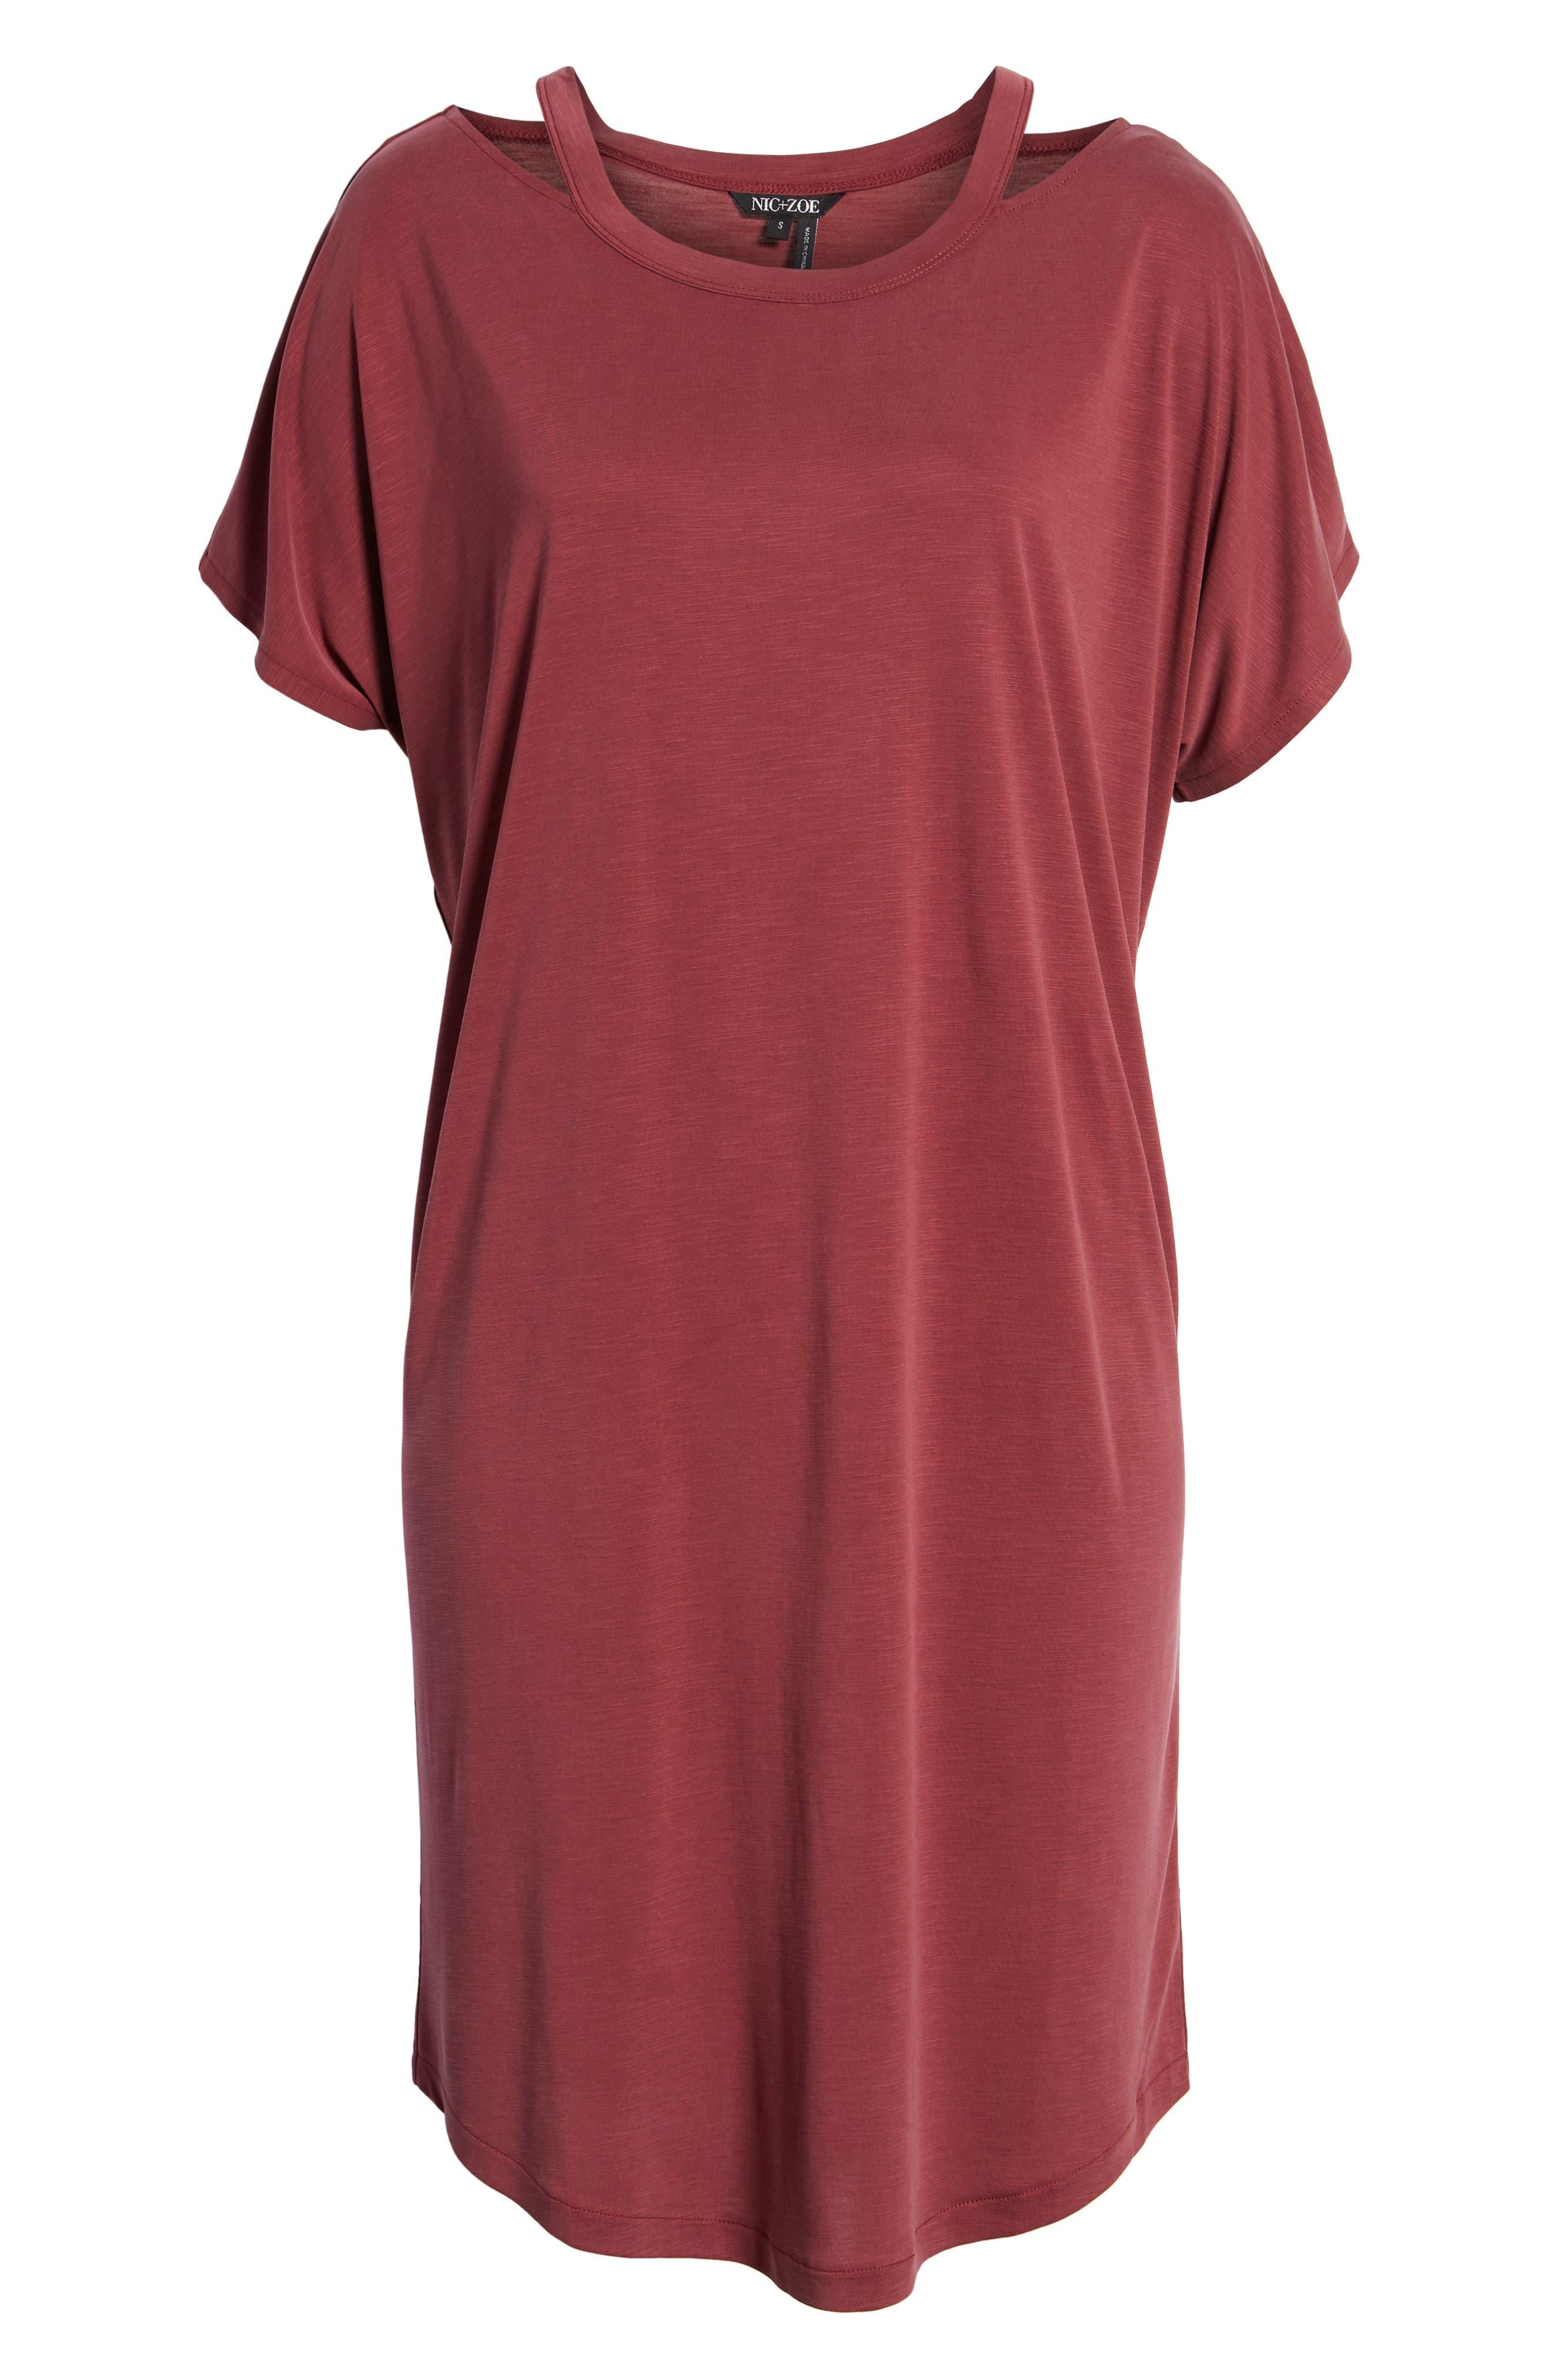 Open Road Dress,                             Alternate thumbnail 7, color,                             Washed Raisin